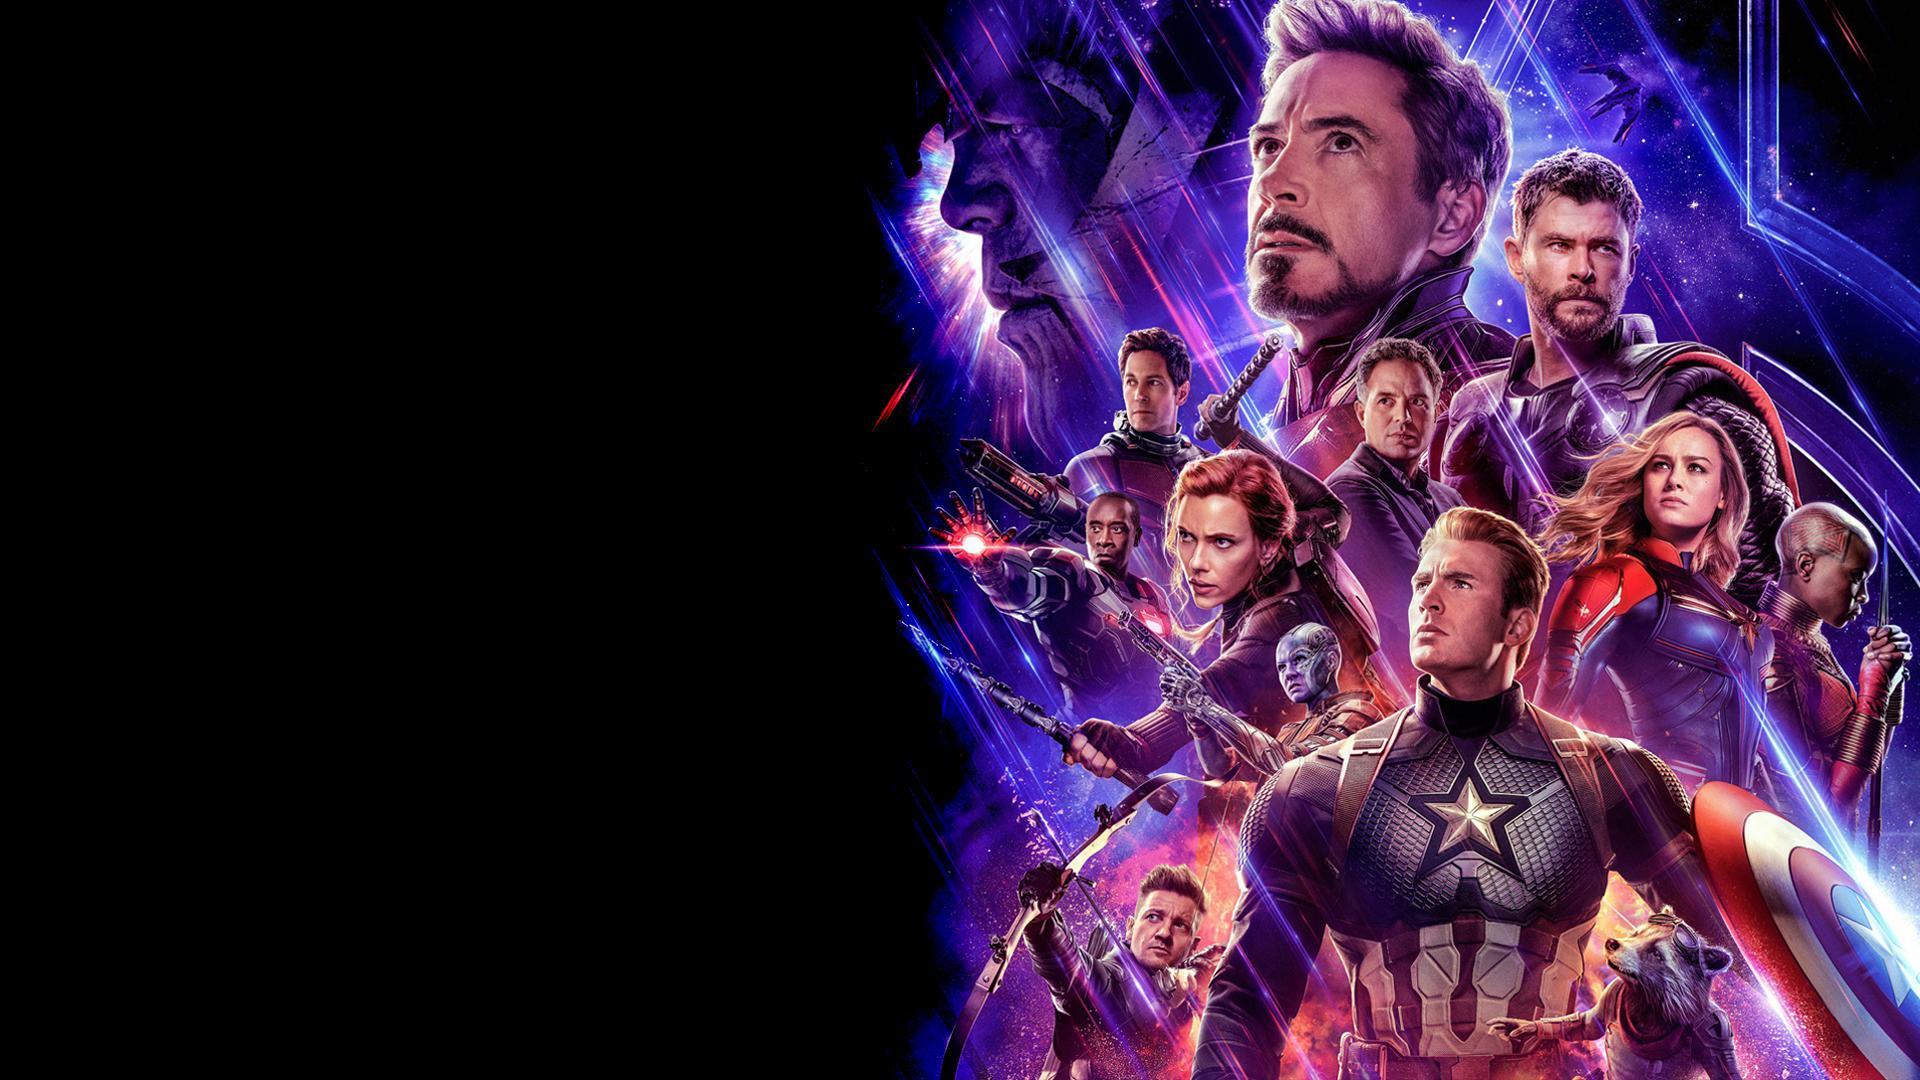 Unduh 9000+ Wallpaper Avengers Endgame Phone  Paling Keren